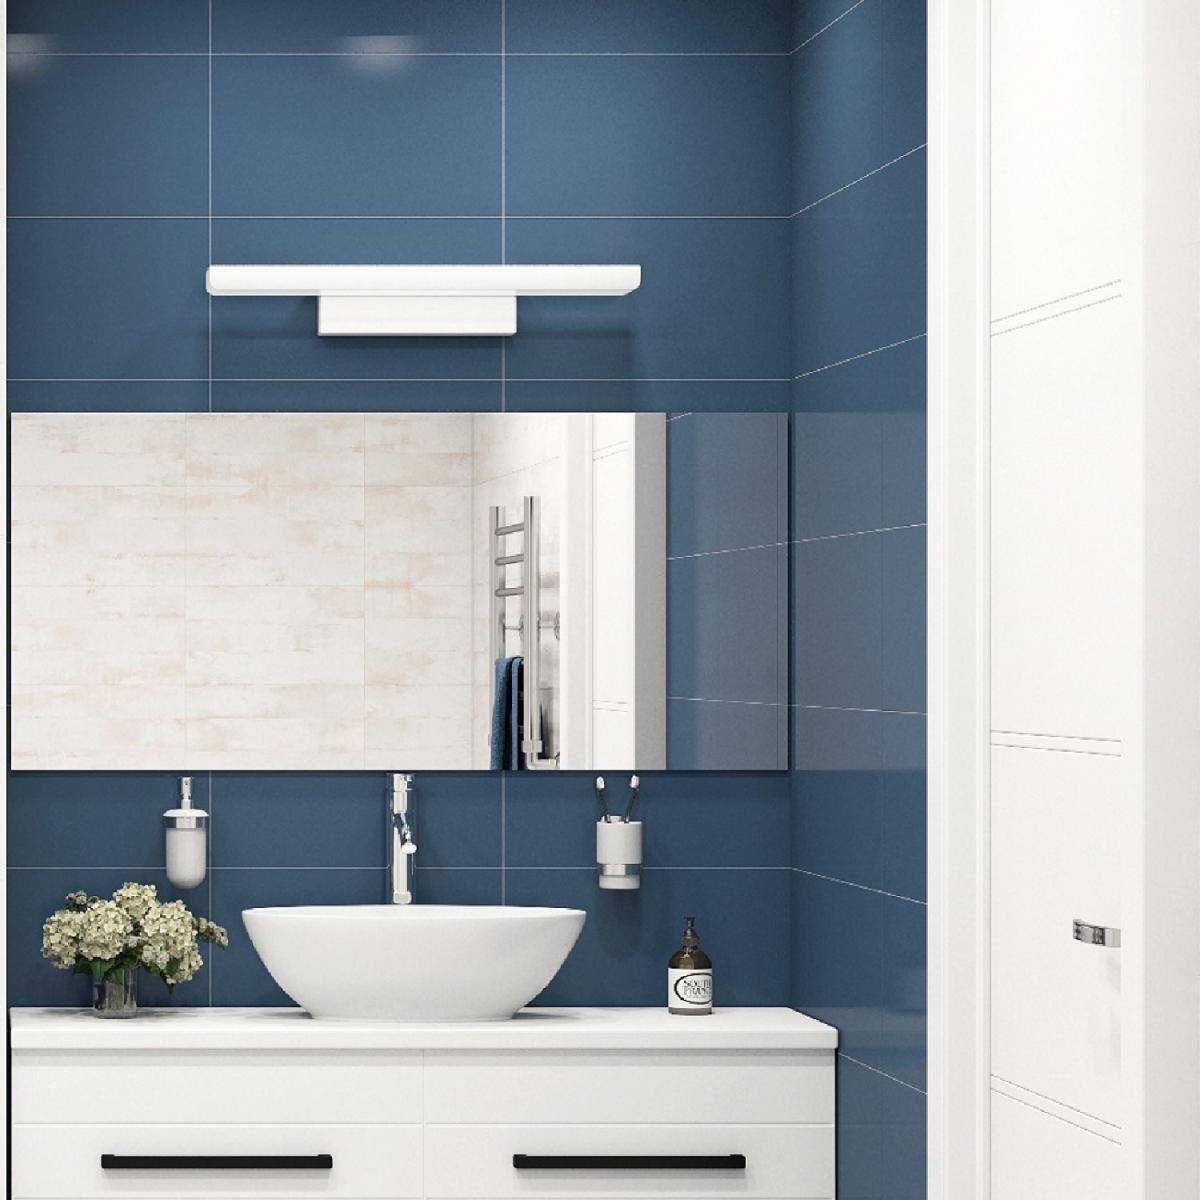 Плитка настенная Блю шеврон 25x45 см 1.46 м² цвет синий